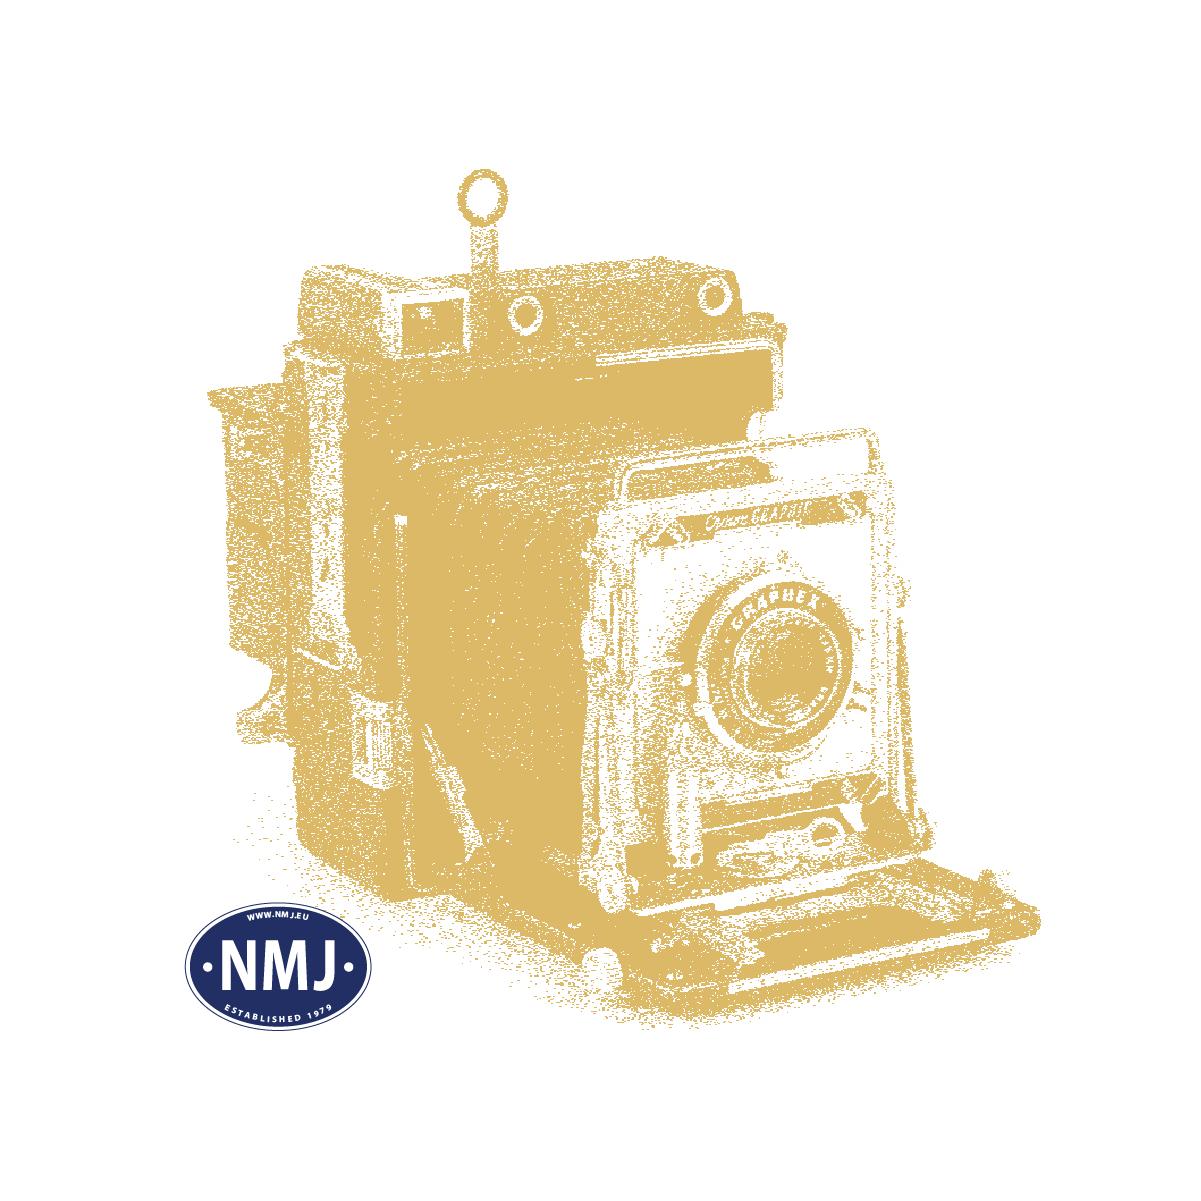 NMJT86.401 - NMJ Topline NSB El11.2102, Nydesign, DC